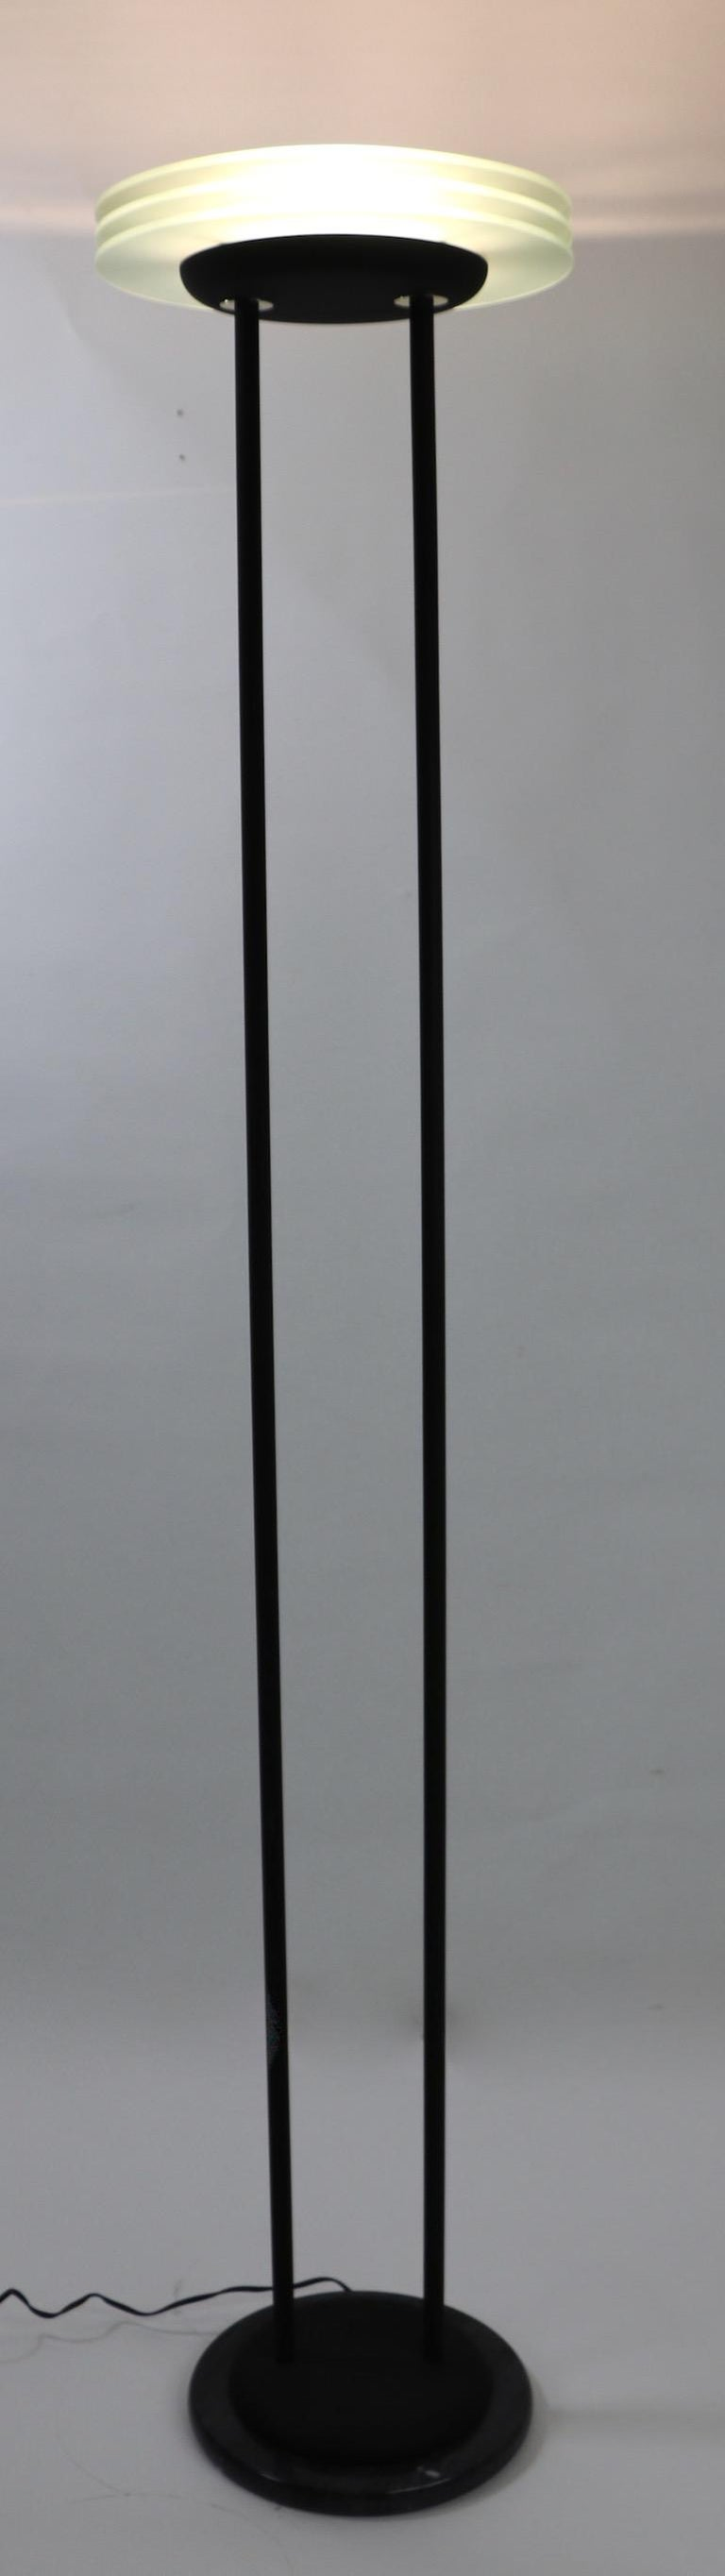 Postmodern Halogen Floor Lamp Torchiere For Sale At 1stdibs